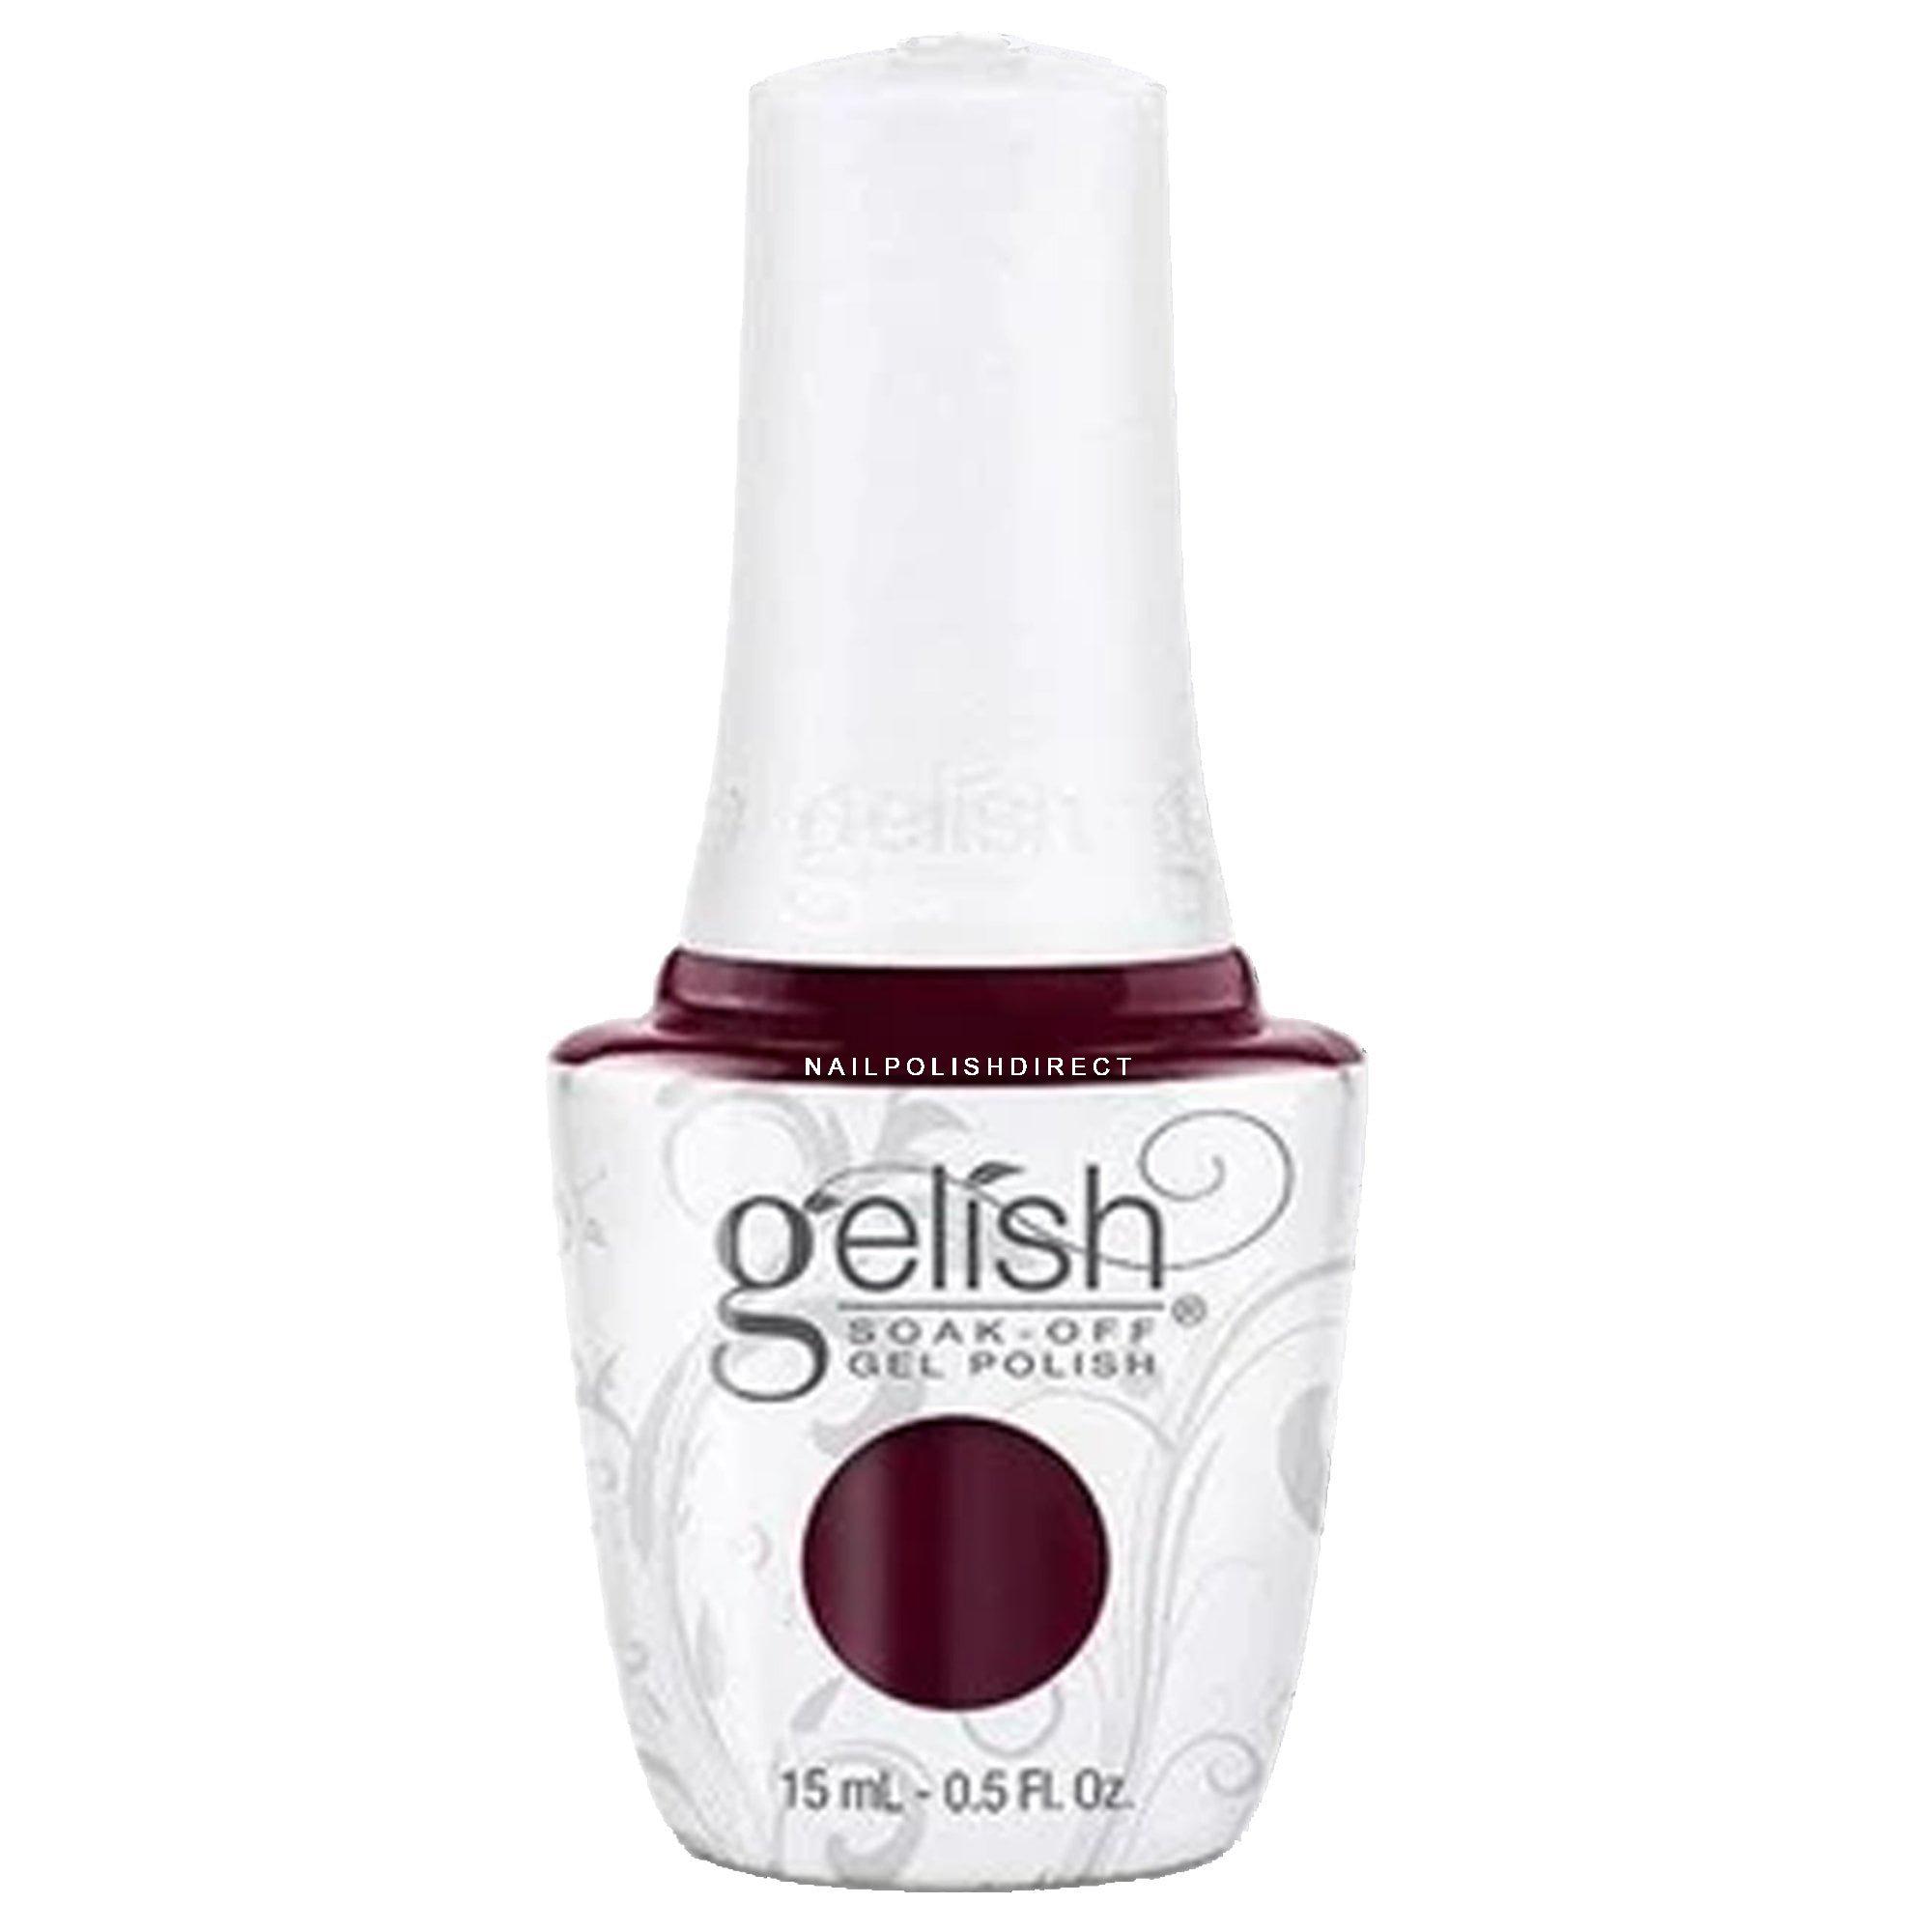 Gelish Soak-Off Gel Nail Polish - You\'re So Elf-Centered! 15ml